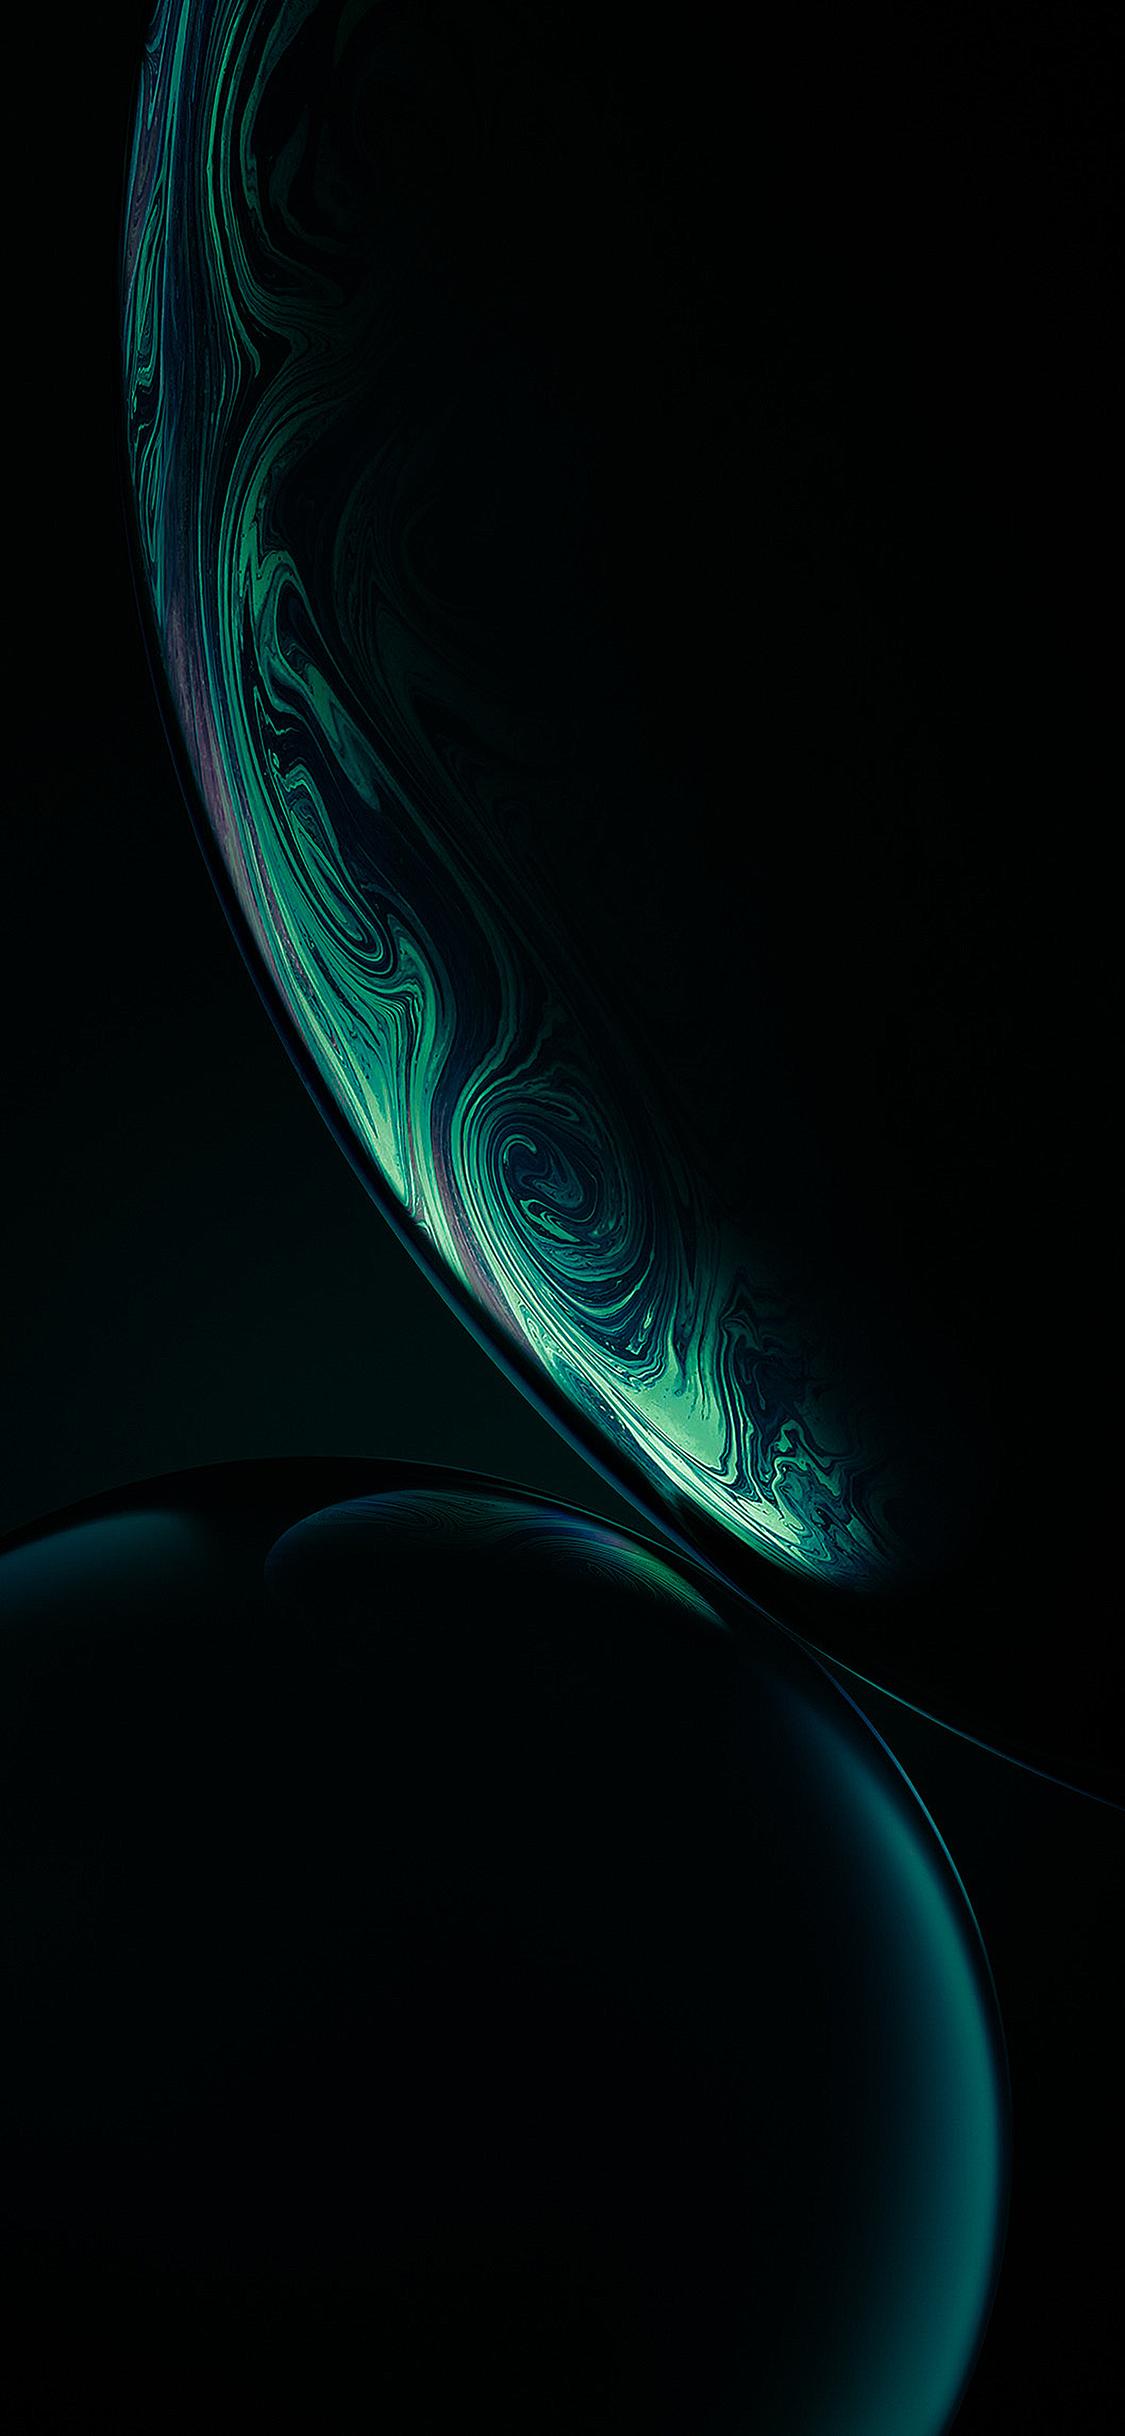 Épinglé par Kamylla Costa sur Wallpaper Iphone 11, X/XS